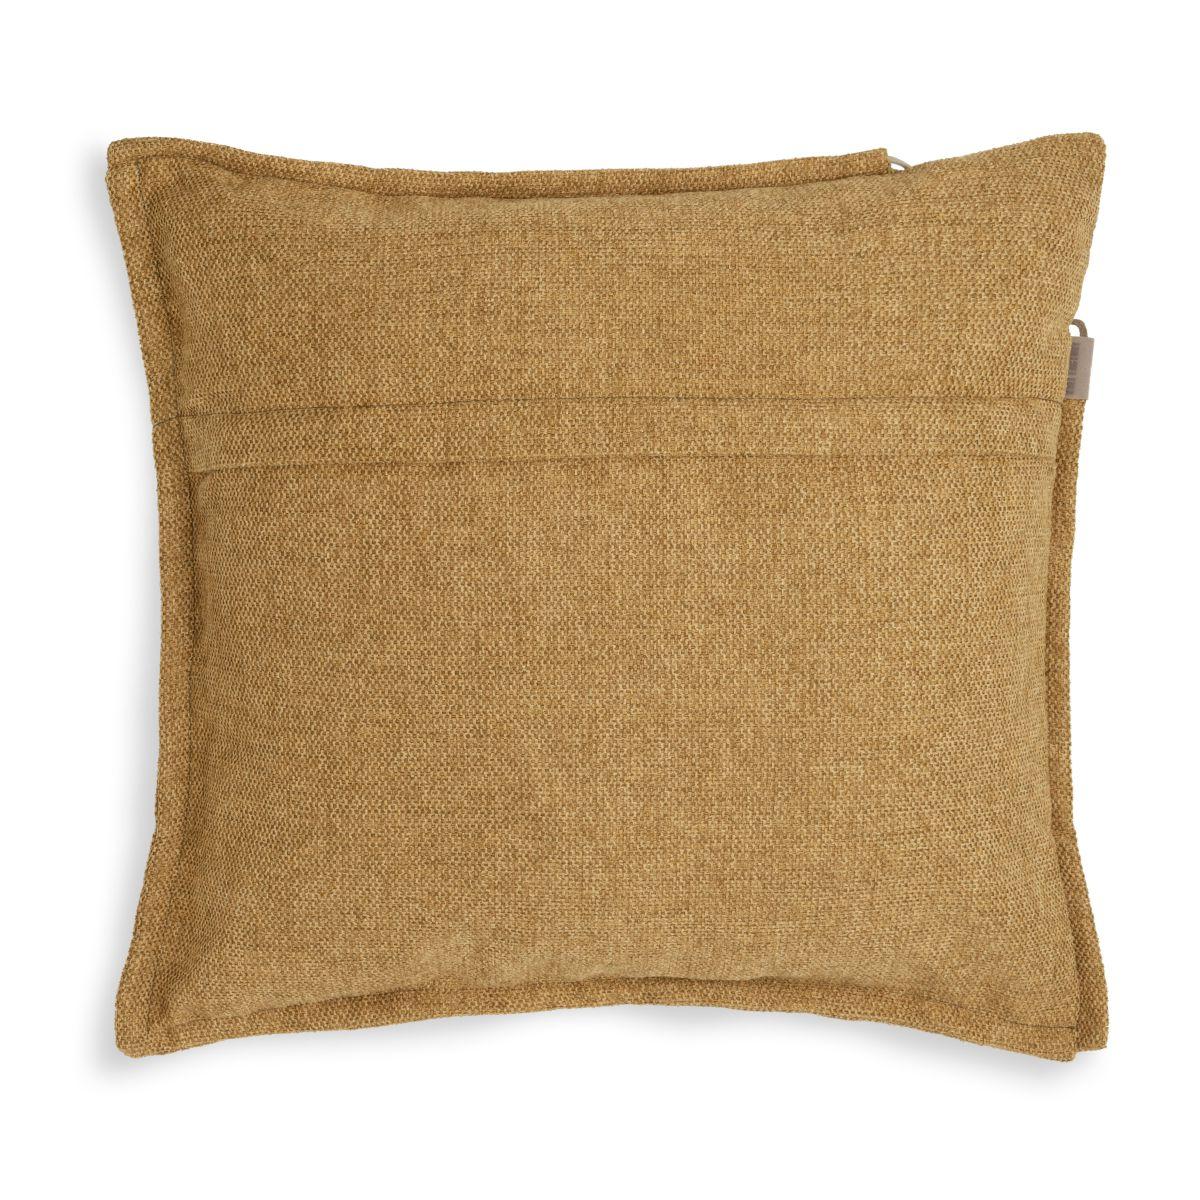 knit factory kf153012017 imre kussen oker 50x50 2